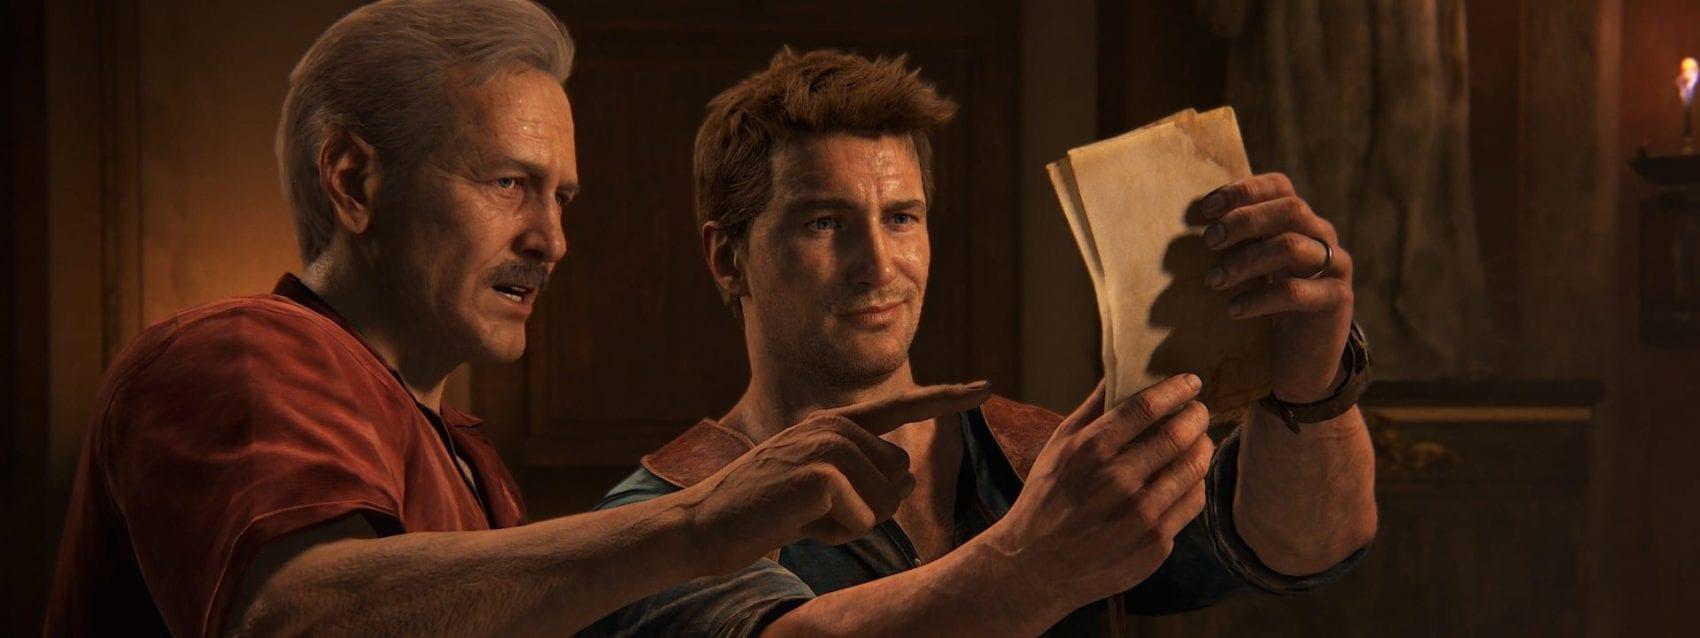 Battle Lara Croft VS Nathan Drake My Geek Actu Uncharted 4.jpg